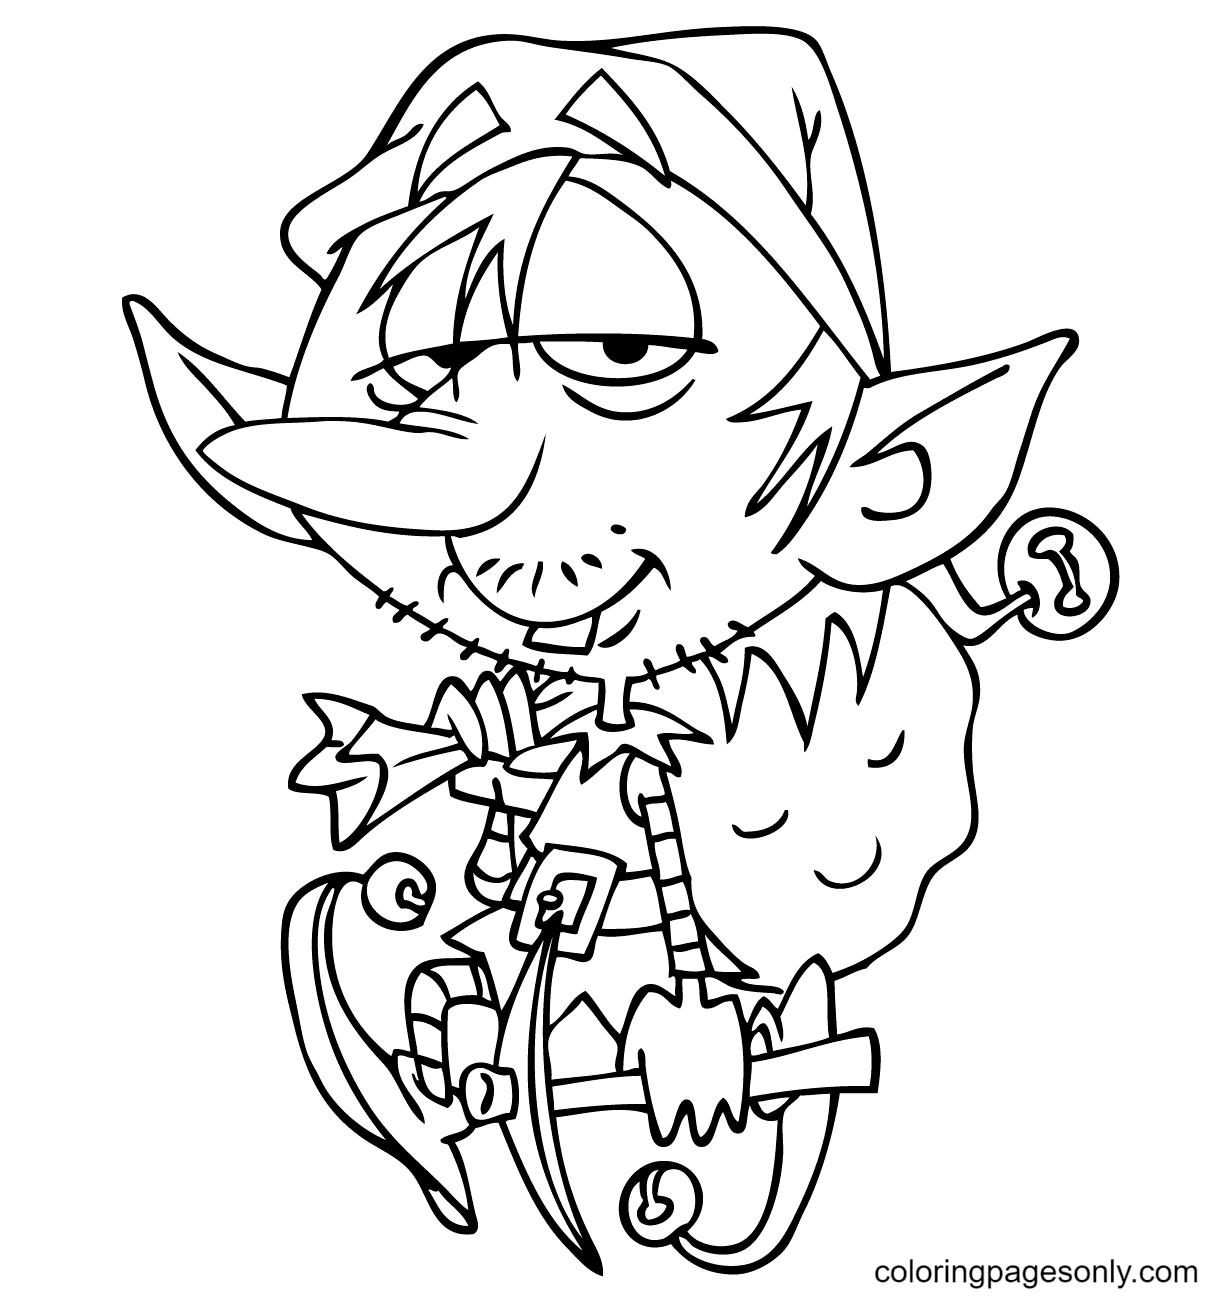 Cartoon Elf Carrying Santa Bag Coloring Page